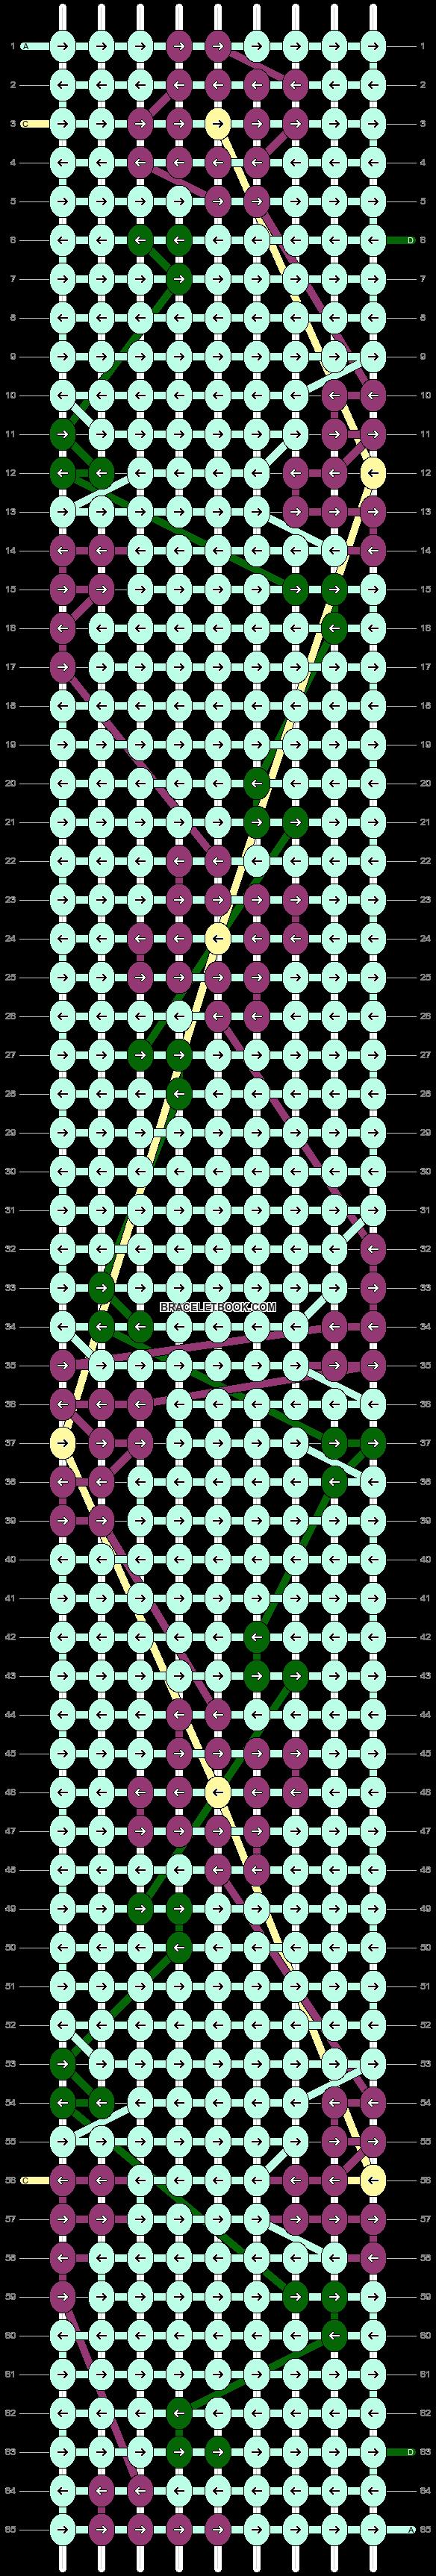 Alpha pattern #21241 variation #2364 pattern